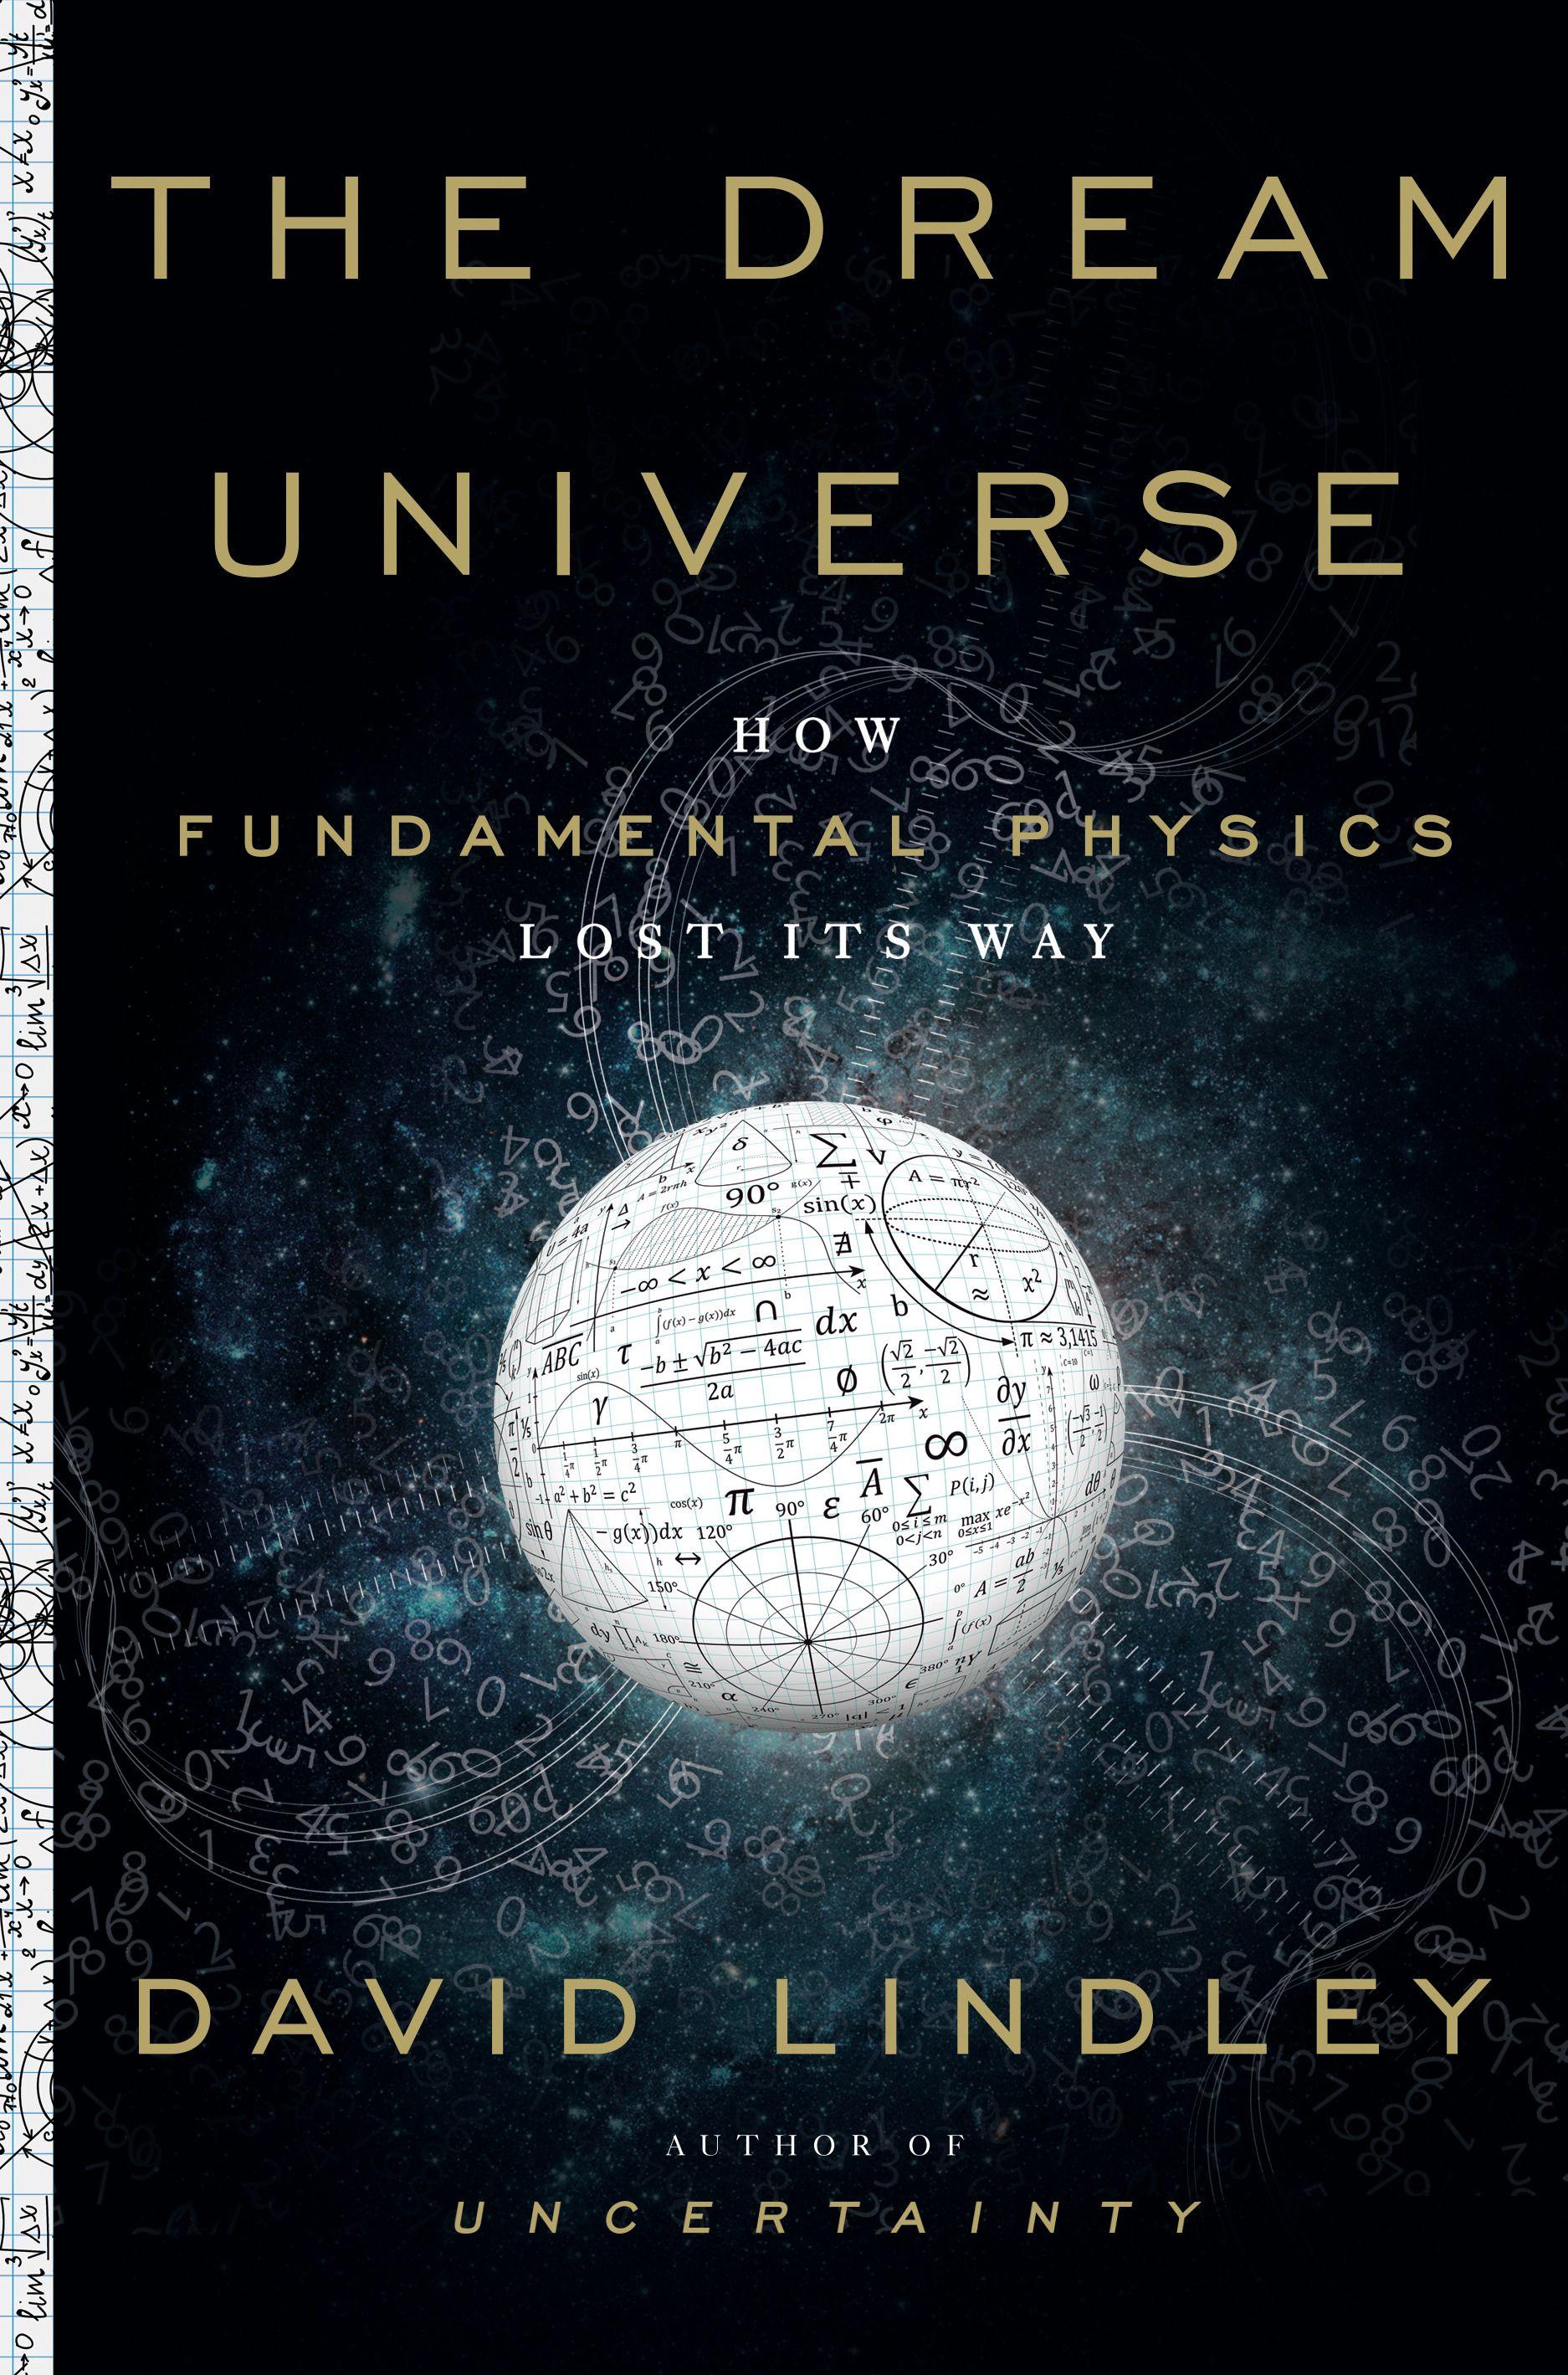 The Dream Universe By David Lindley 9780385543859 Penguinrandomhouse Com Books Physics Physics Books Theoretical Physics